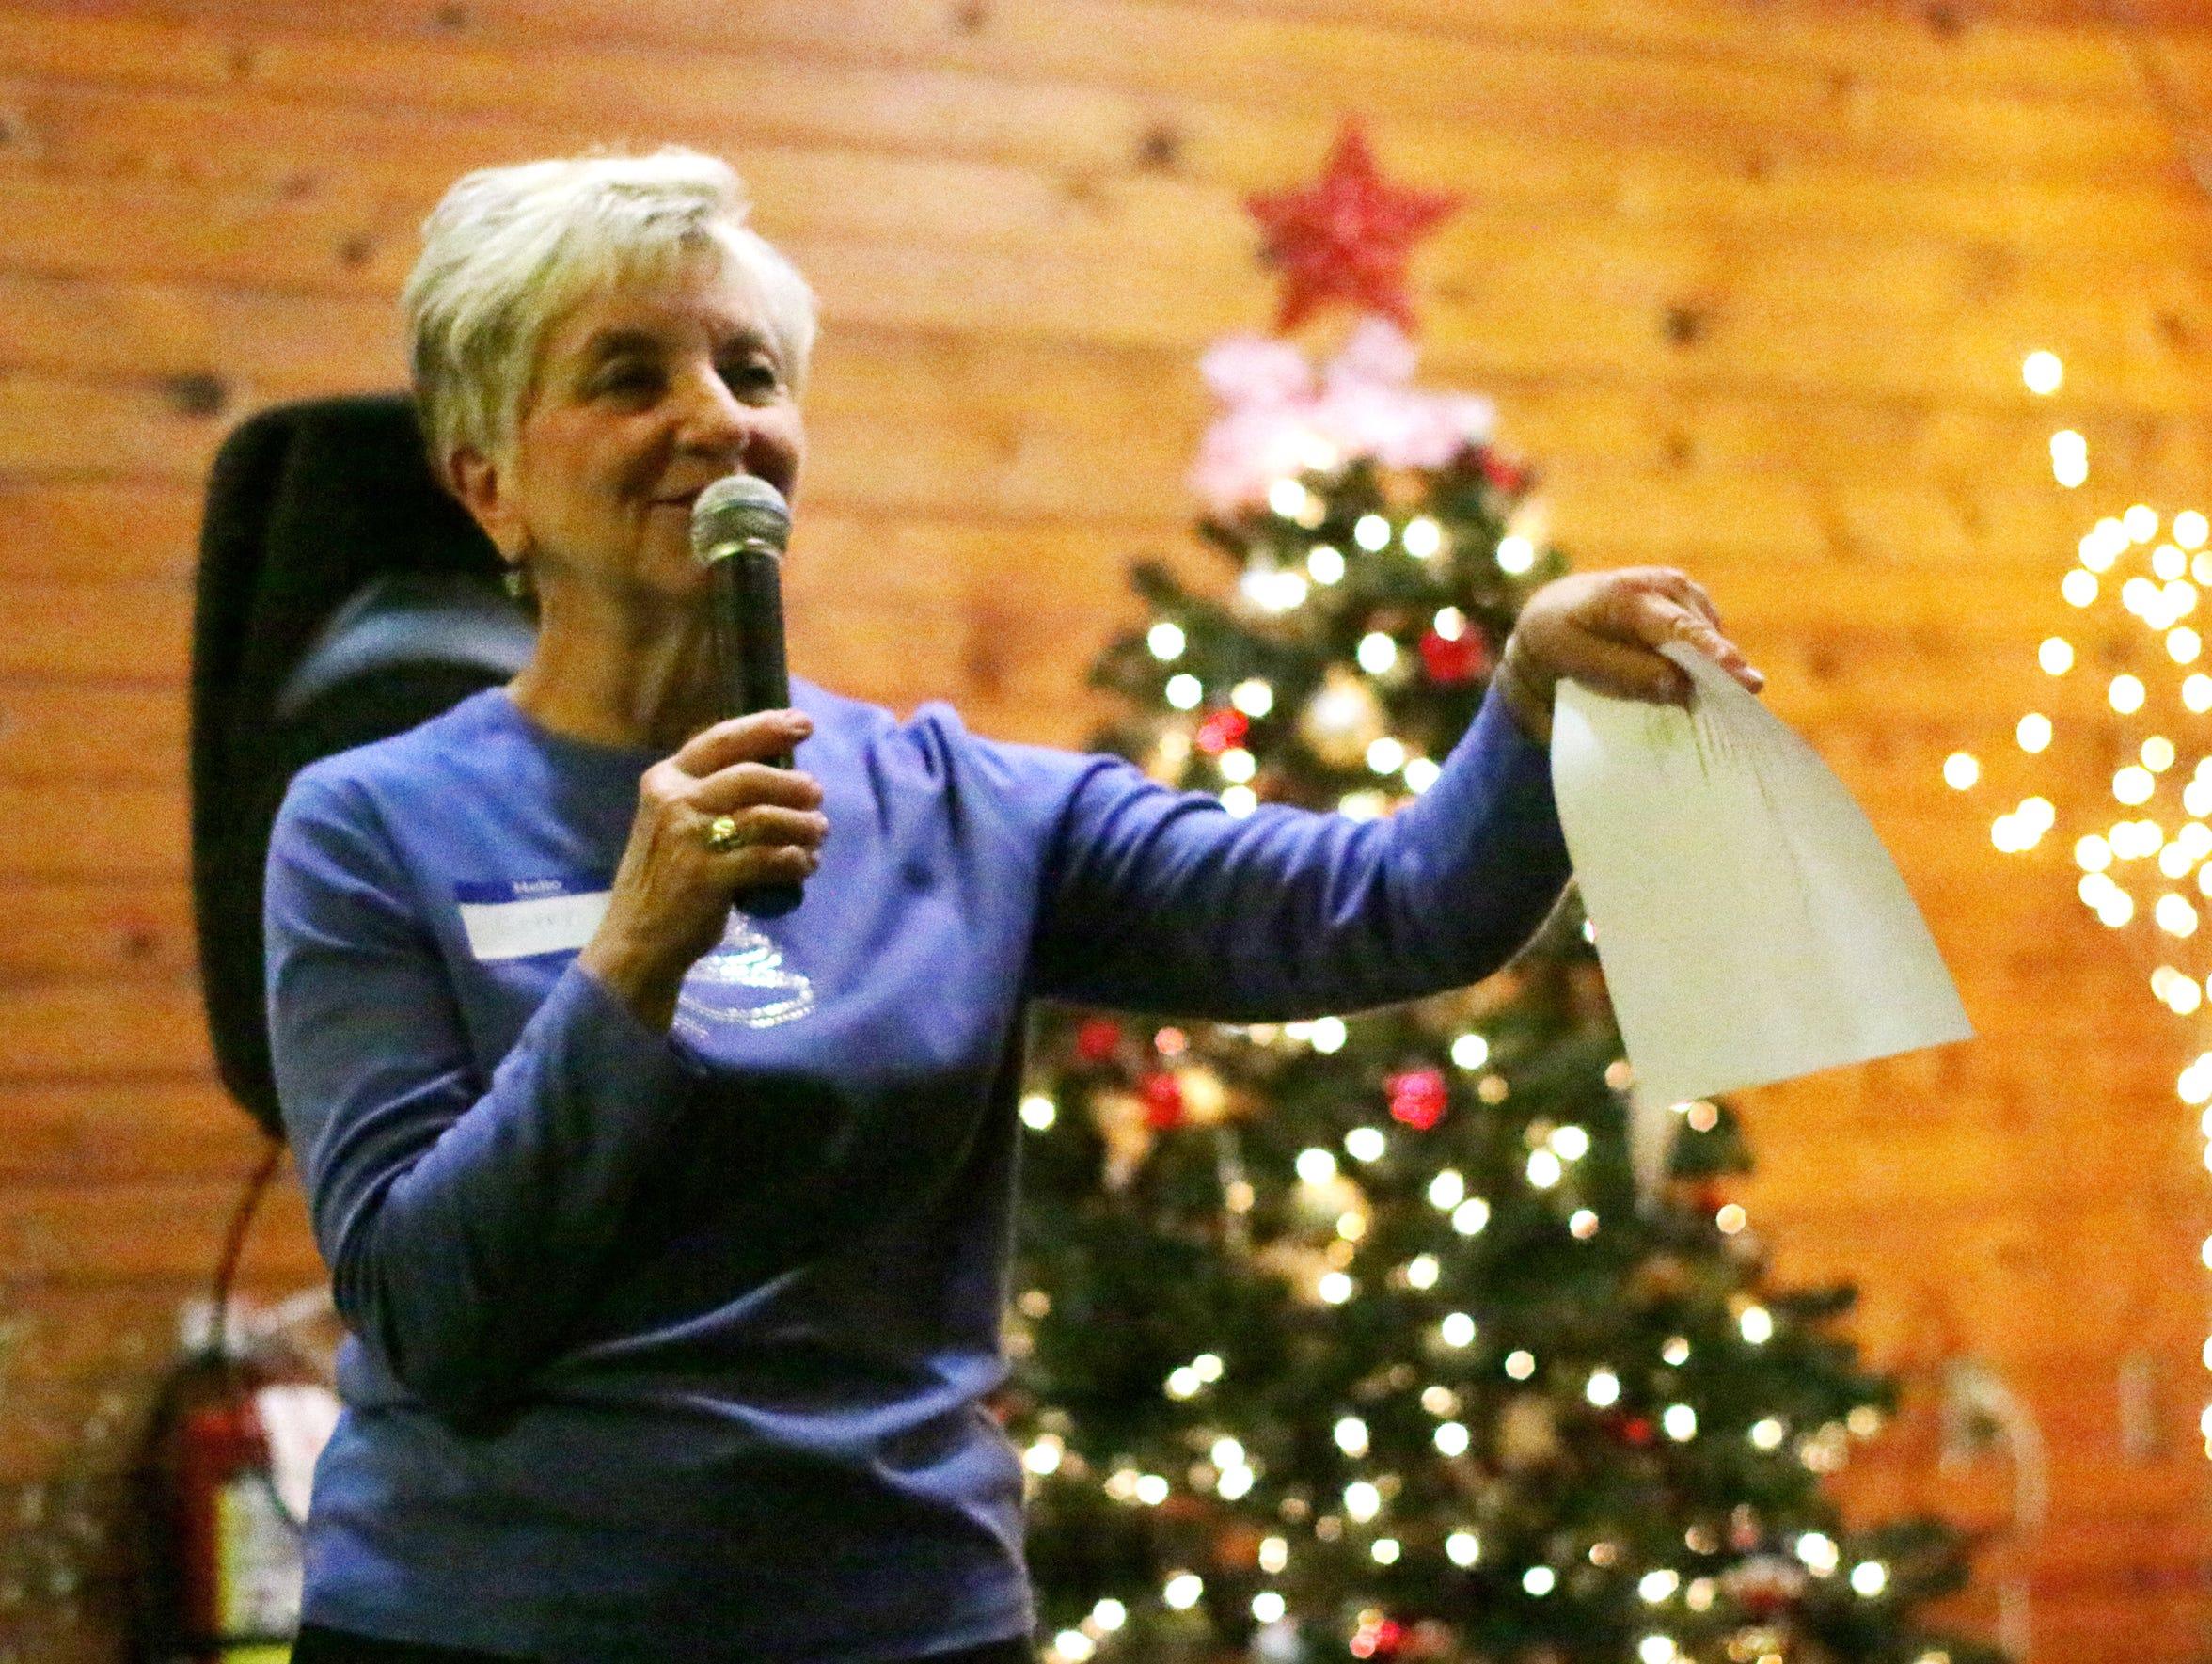 Making Spirits Bright's Geraldine Plehn gives a speech